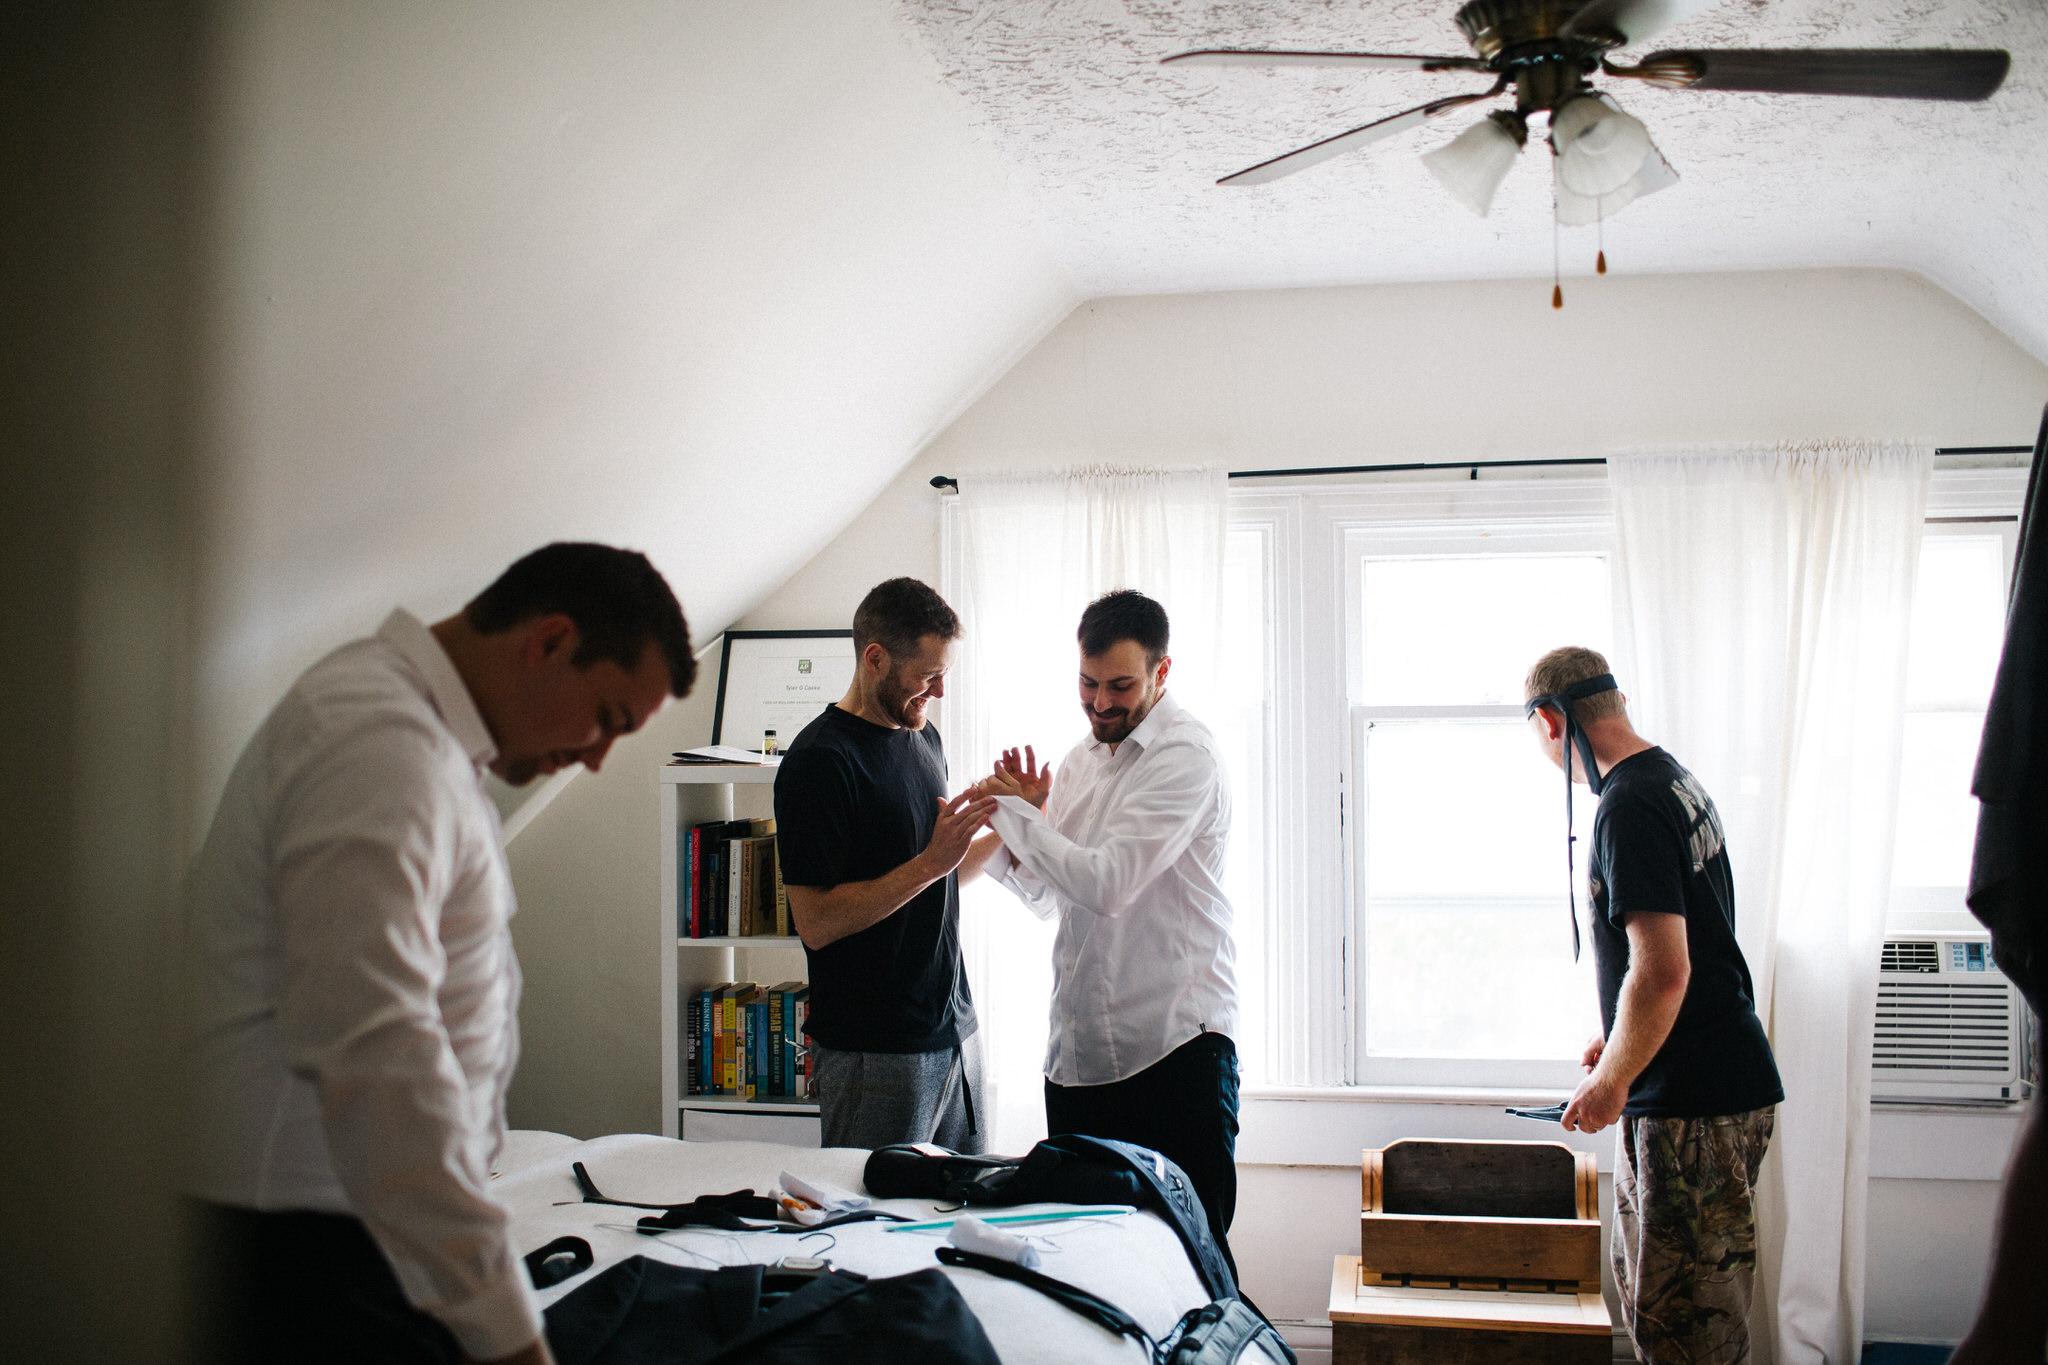 groom getting dressed, wedding day photos, documentary wedding photographer toronto, berkeley church toronto, groomsmen getting ready